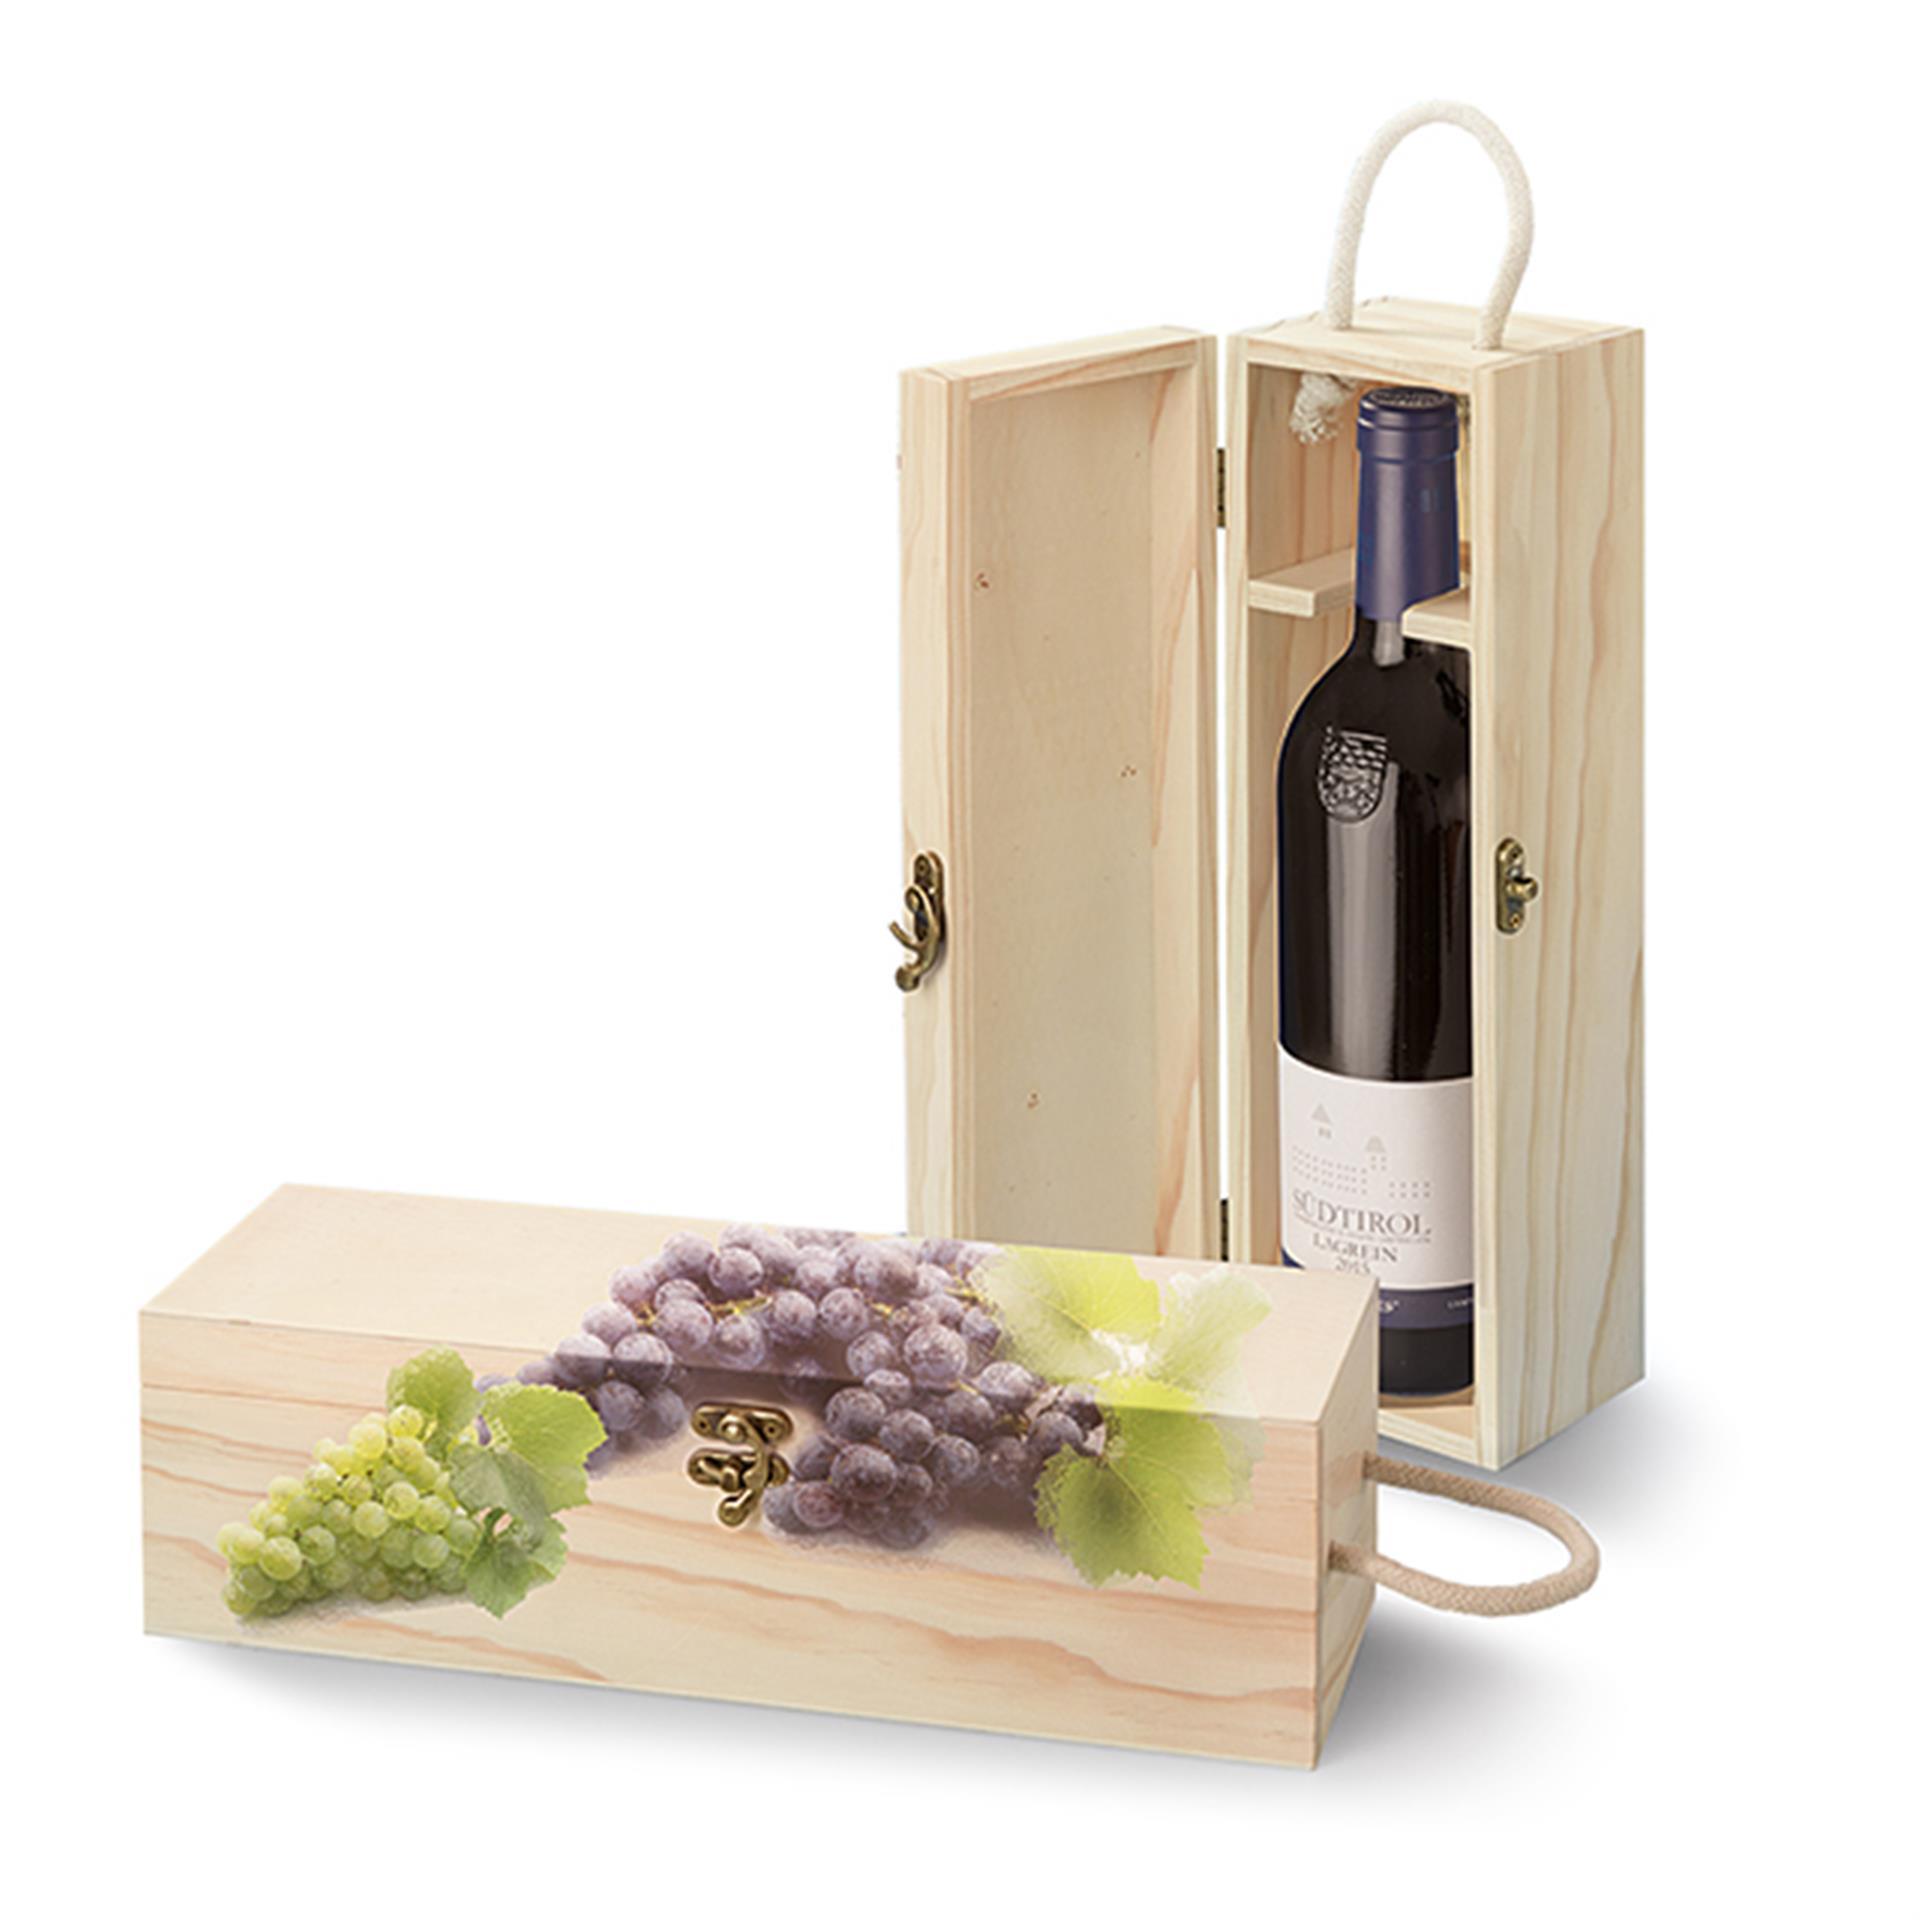 Holz Weinbox zum Bemalen 2 Stk.